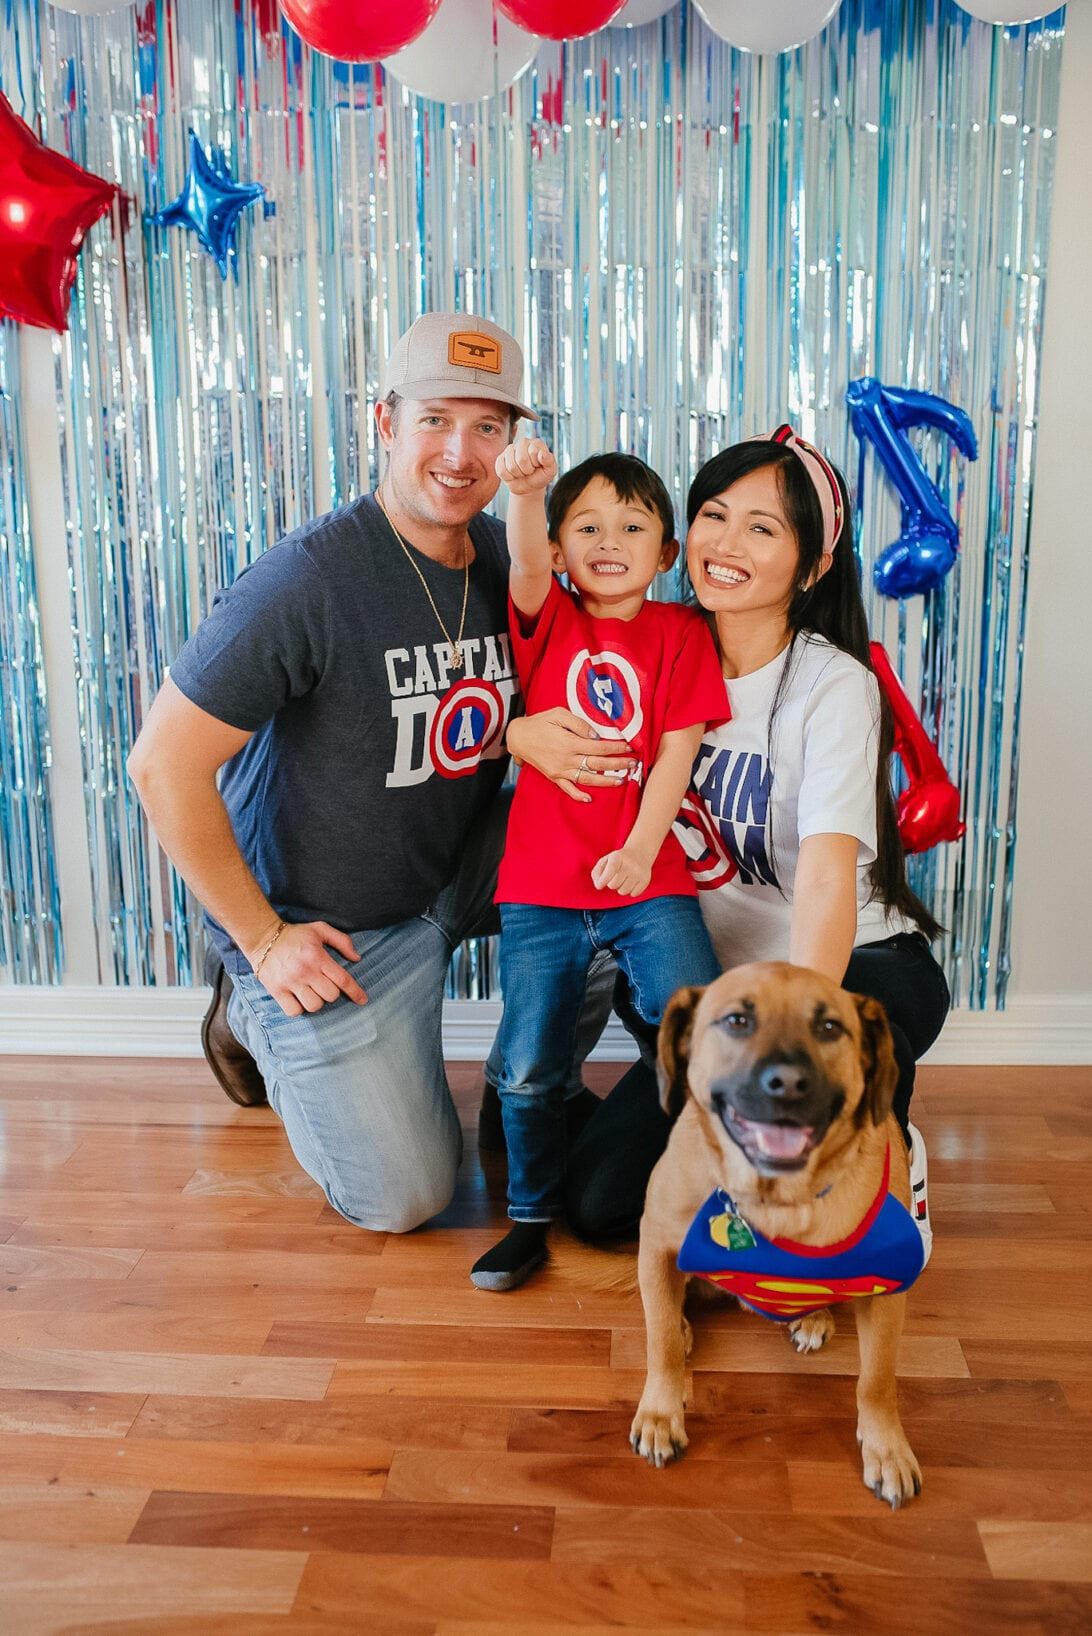 Captain America custom family shirts